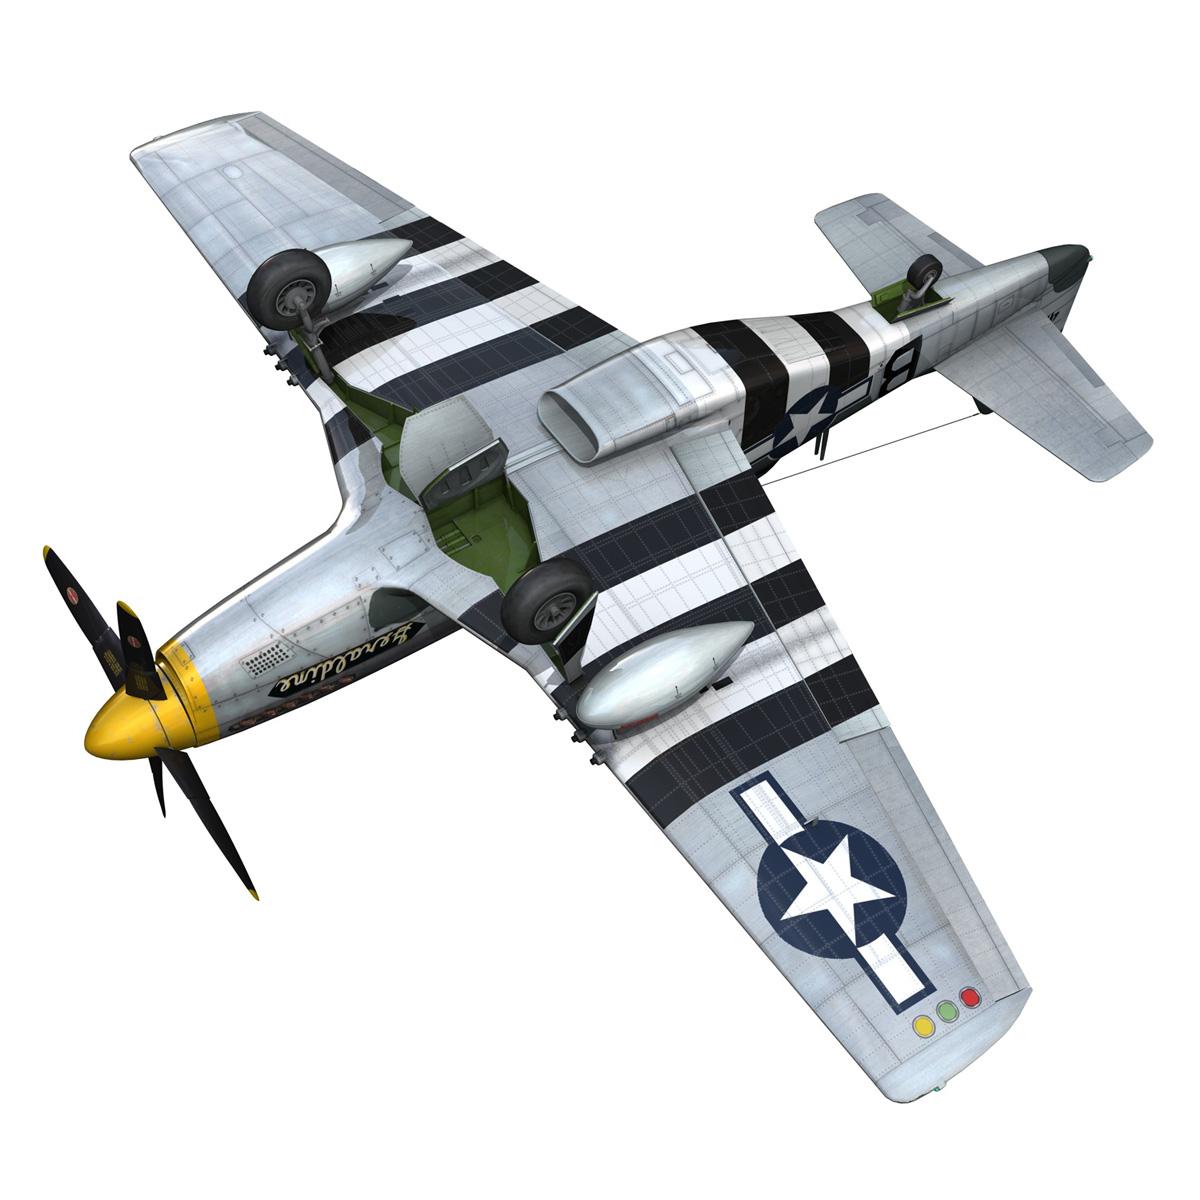 North American P-51D - Geraldine 3d model fbx c4d lwo obj 265952